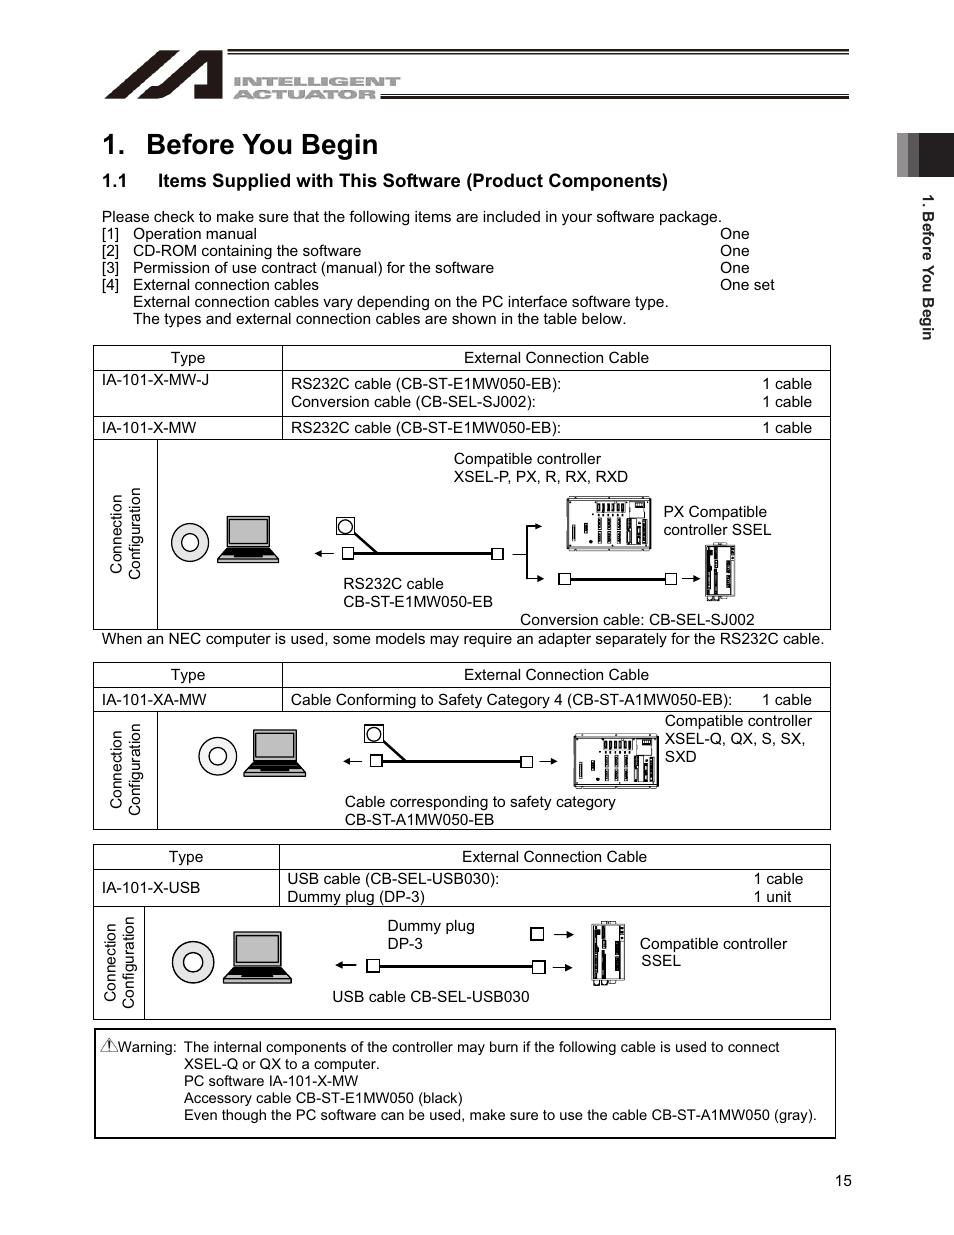 hight resolution of cb diagram st wiring e1mw050 before you begin iai america ia 101 x usbmw user manual page 23before you begin iai